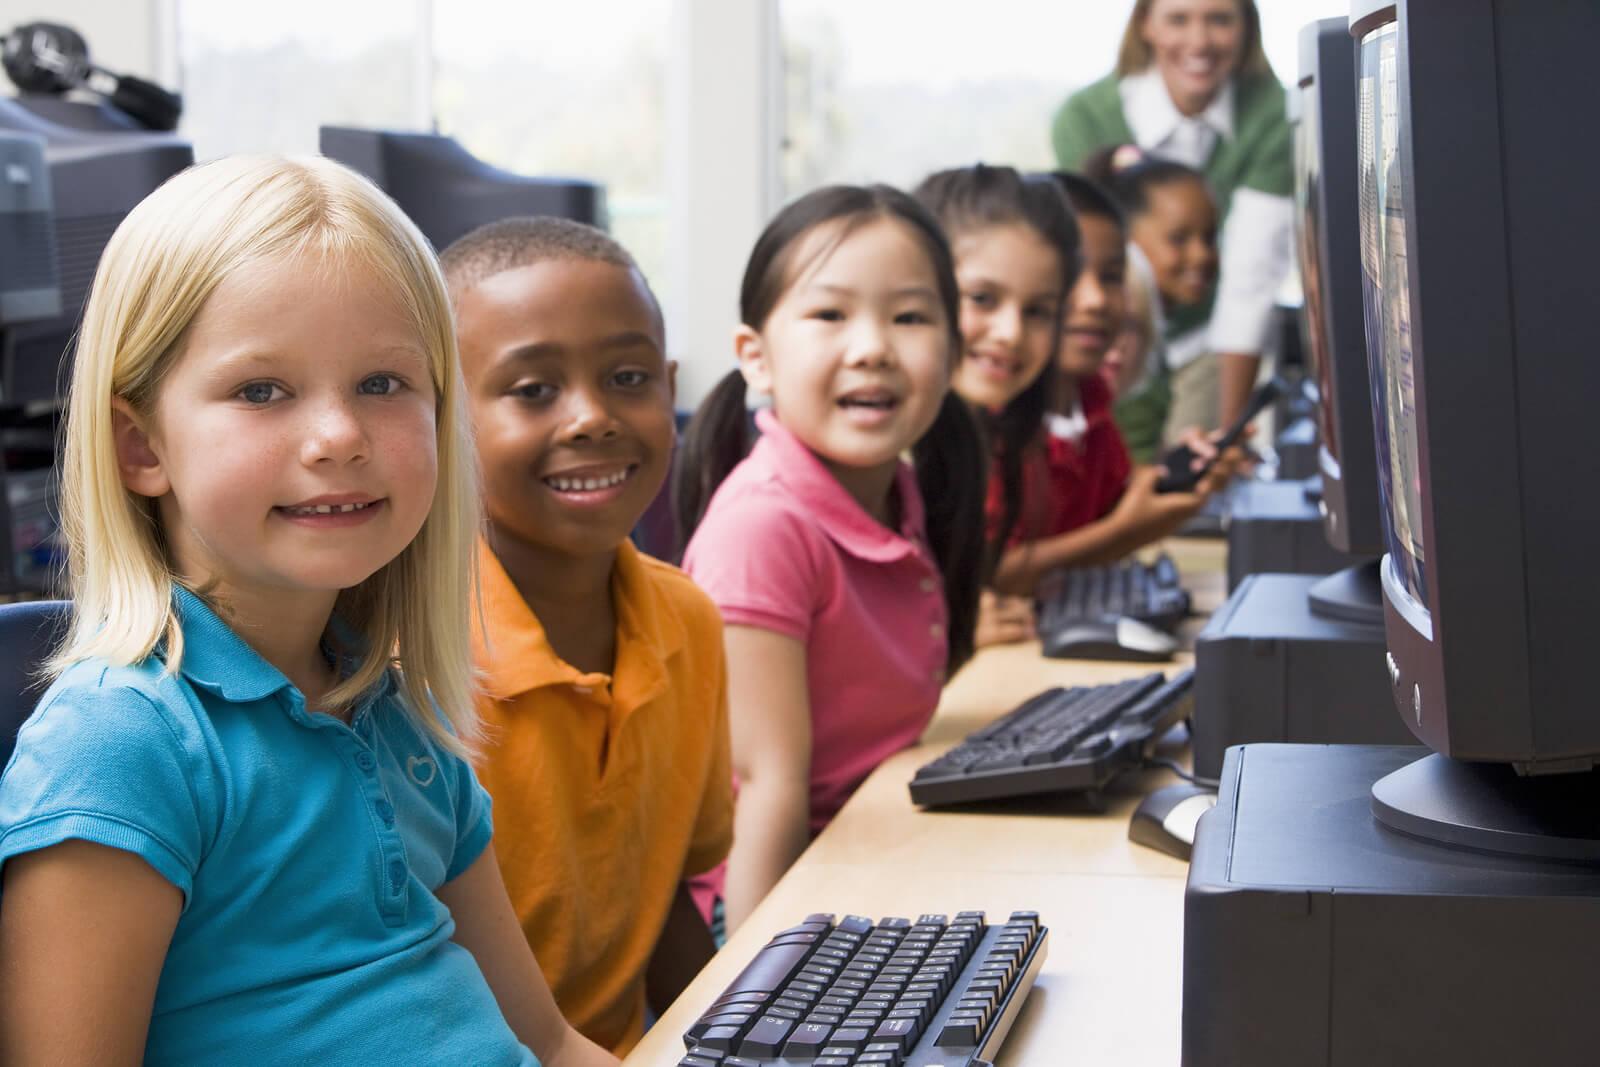 bigstock-Children-At-Computer-Terminals-3917458-1